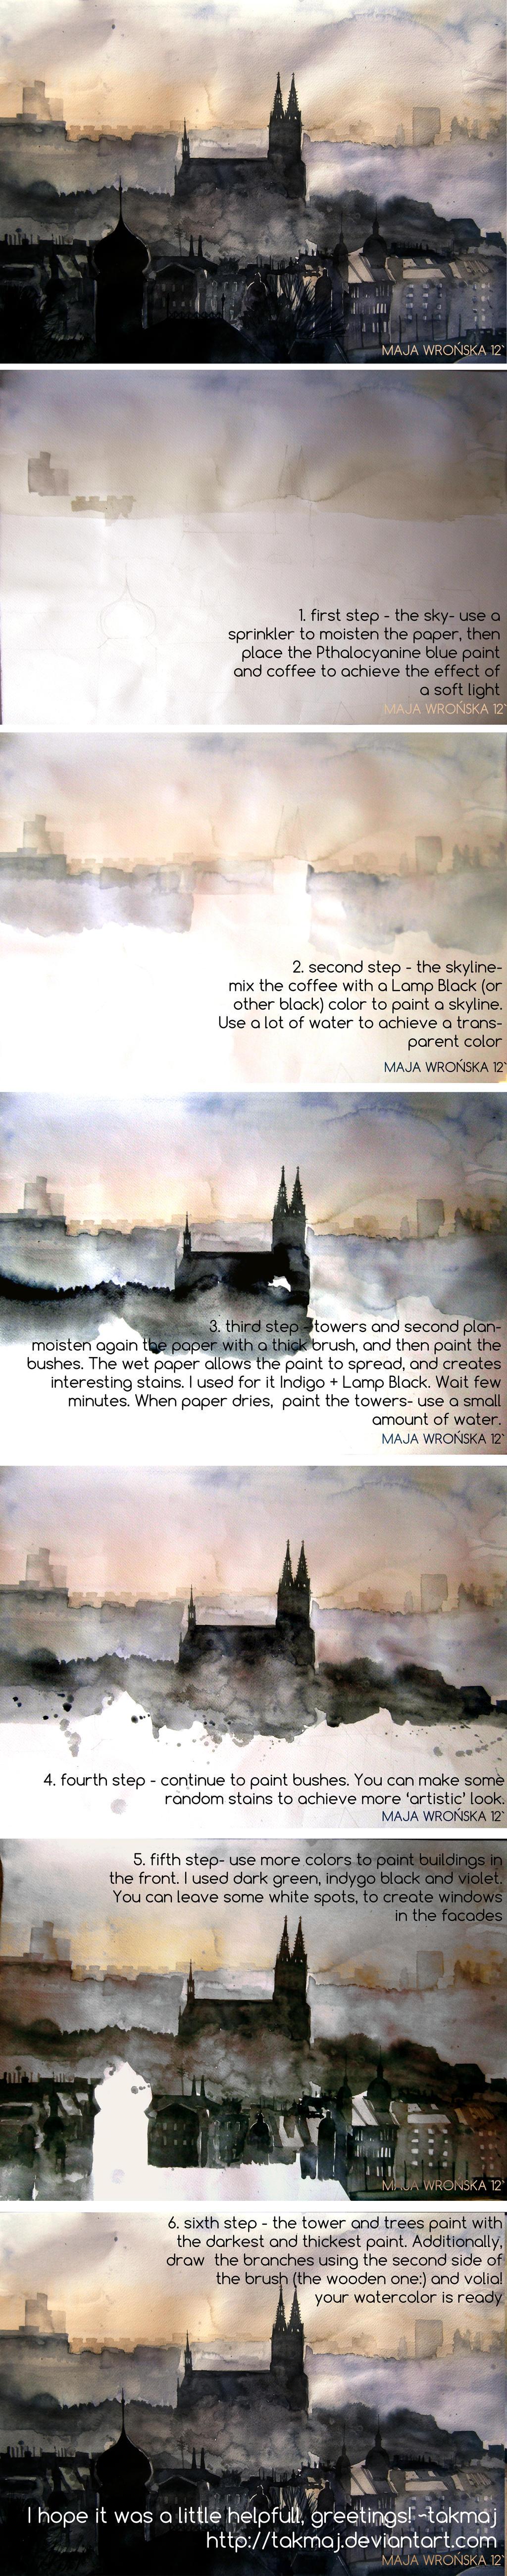 Watercolor tutorial by takmaj on deviantart for Watercolor tutorial